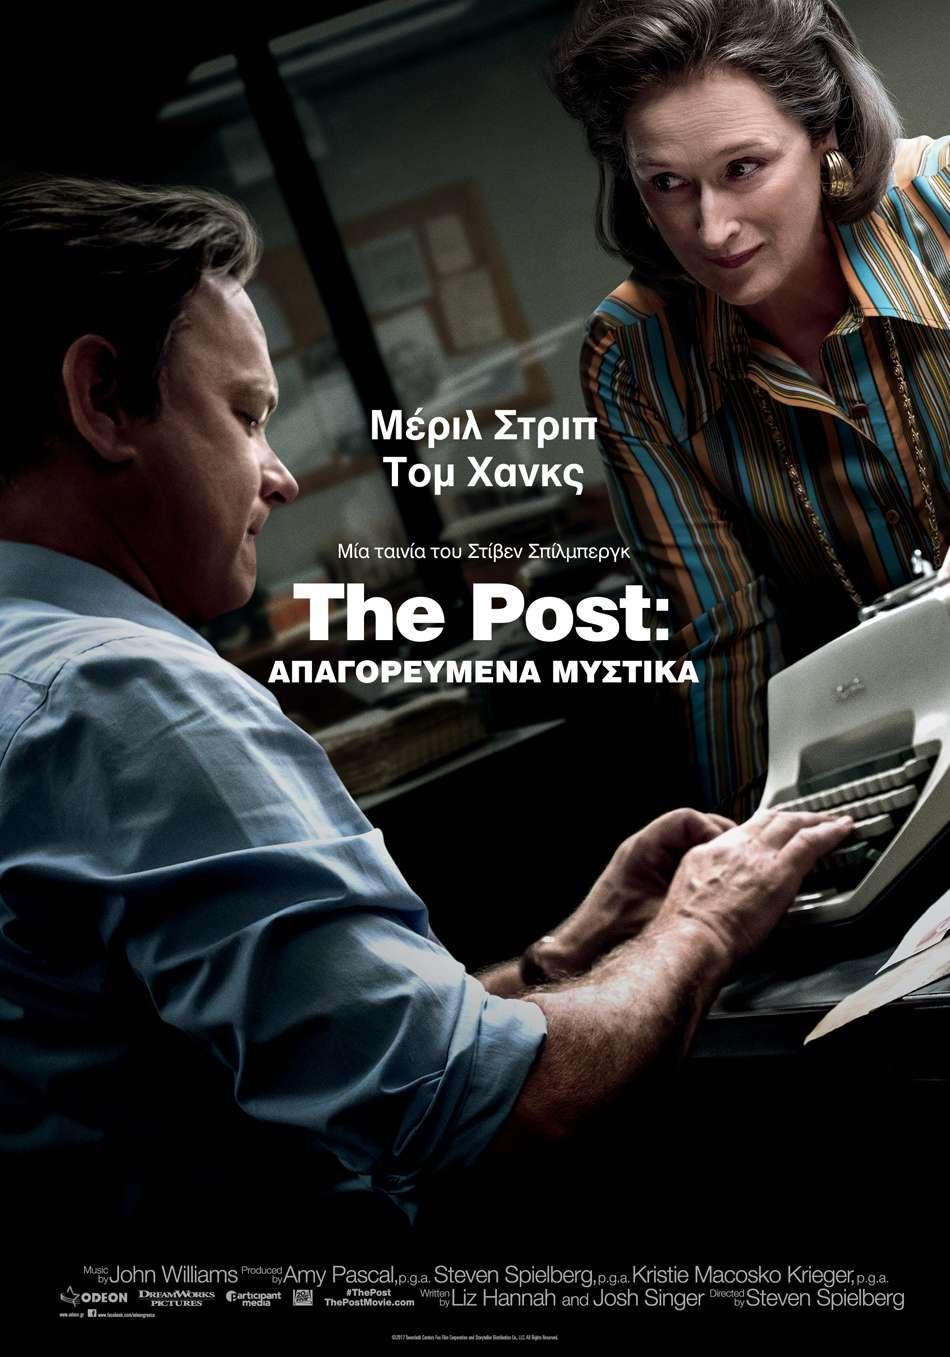 The Post: Απαγορευμένα Μυστικά (The Post) Poster